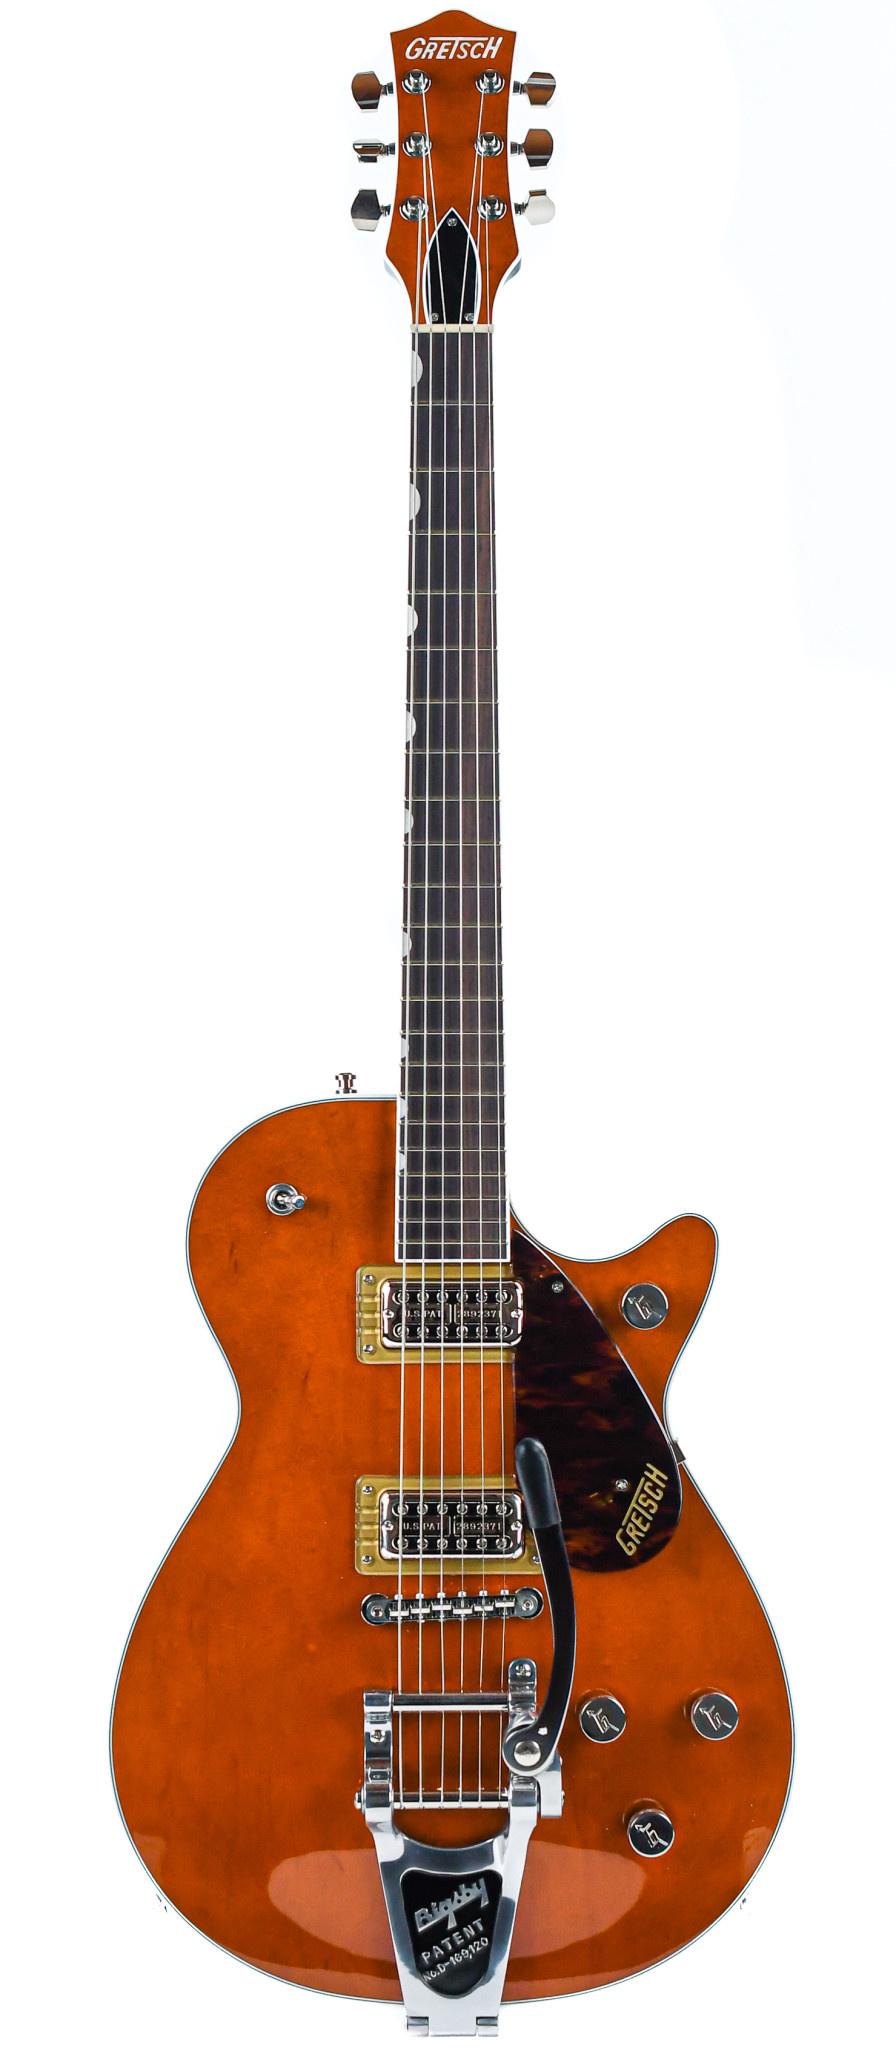 Gretsch G6128T Players Edition Jet FT Roundup Orange